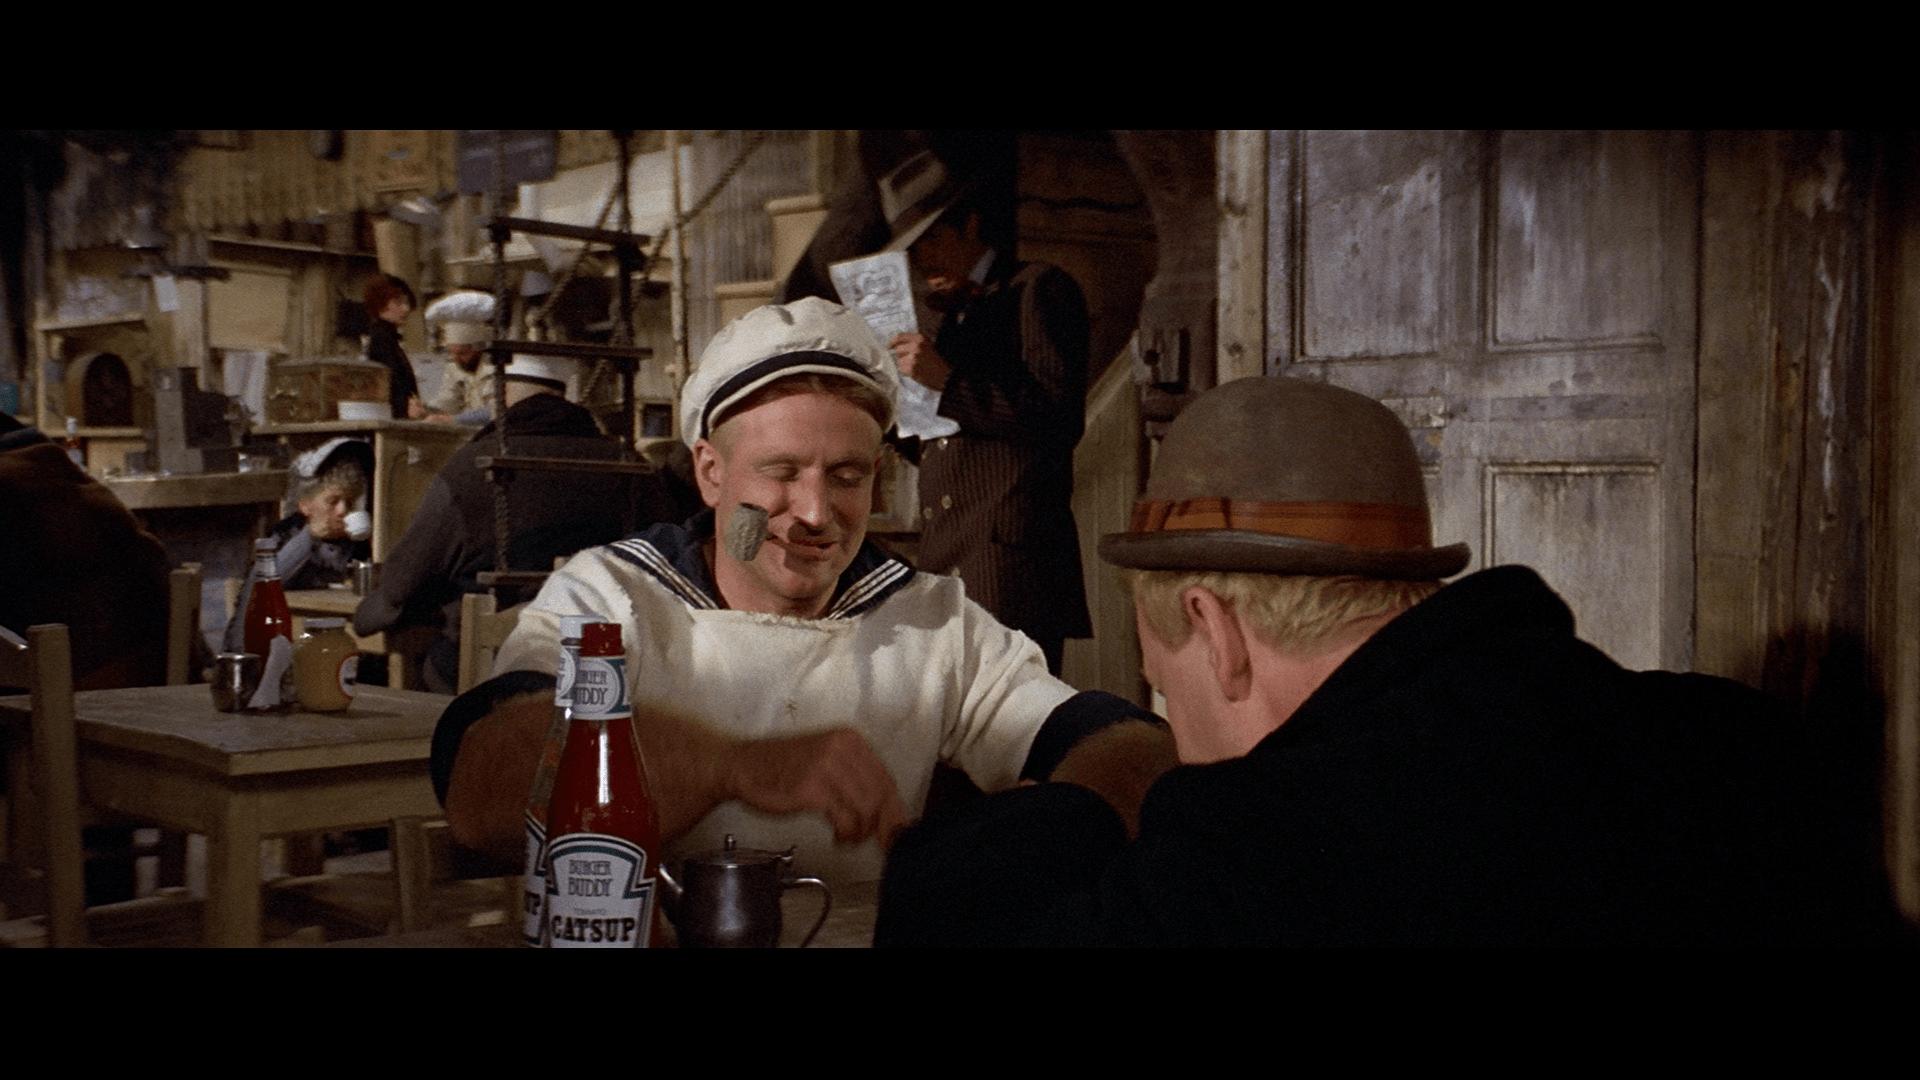 Popeye (1980) [Blu-ray review] 10